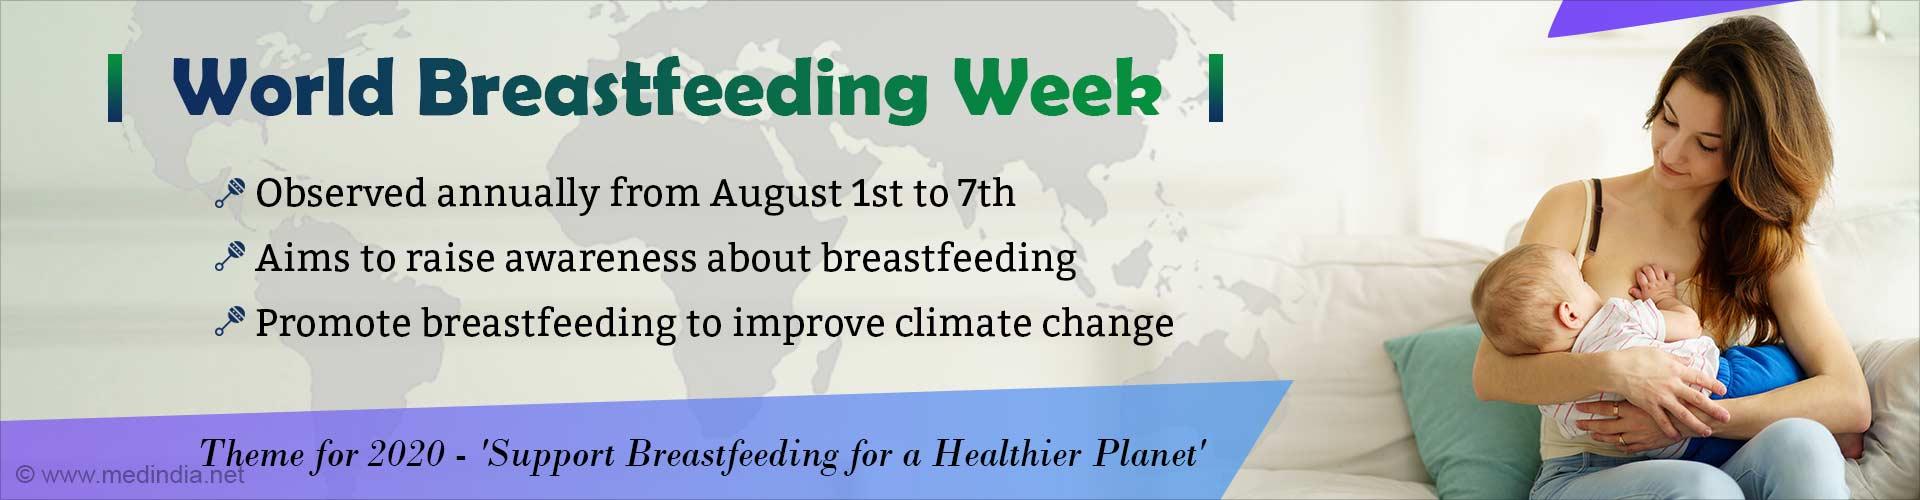 World Breastfeeding Week- Support Breastfeeding for a Healthier Planet